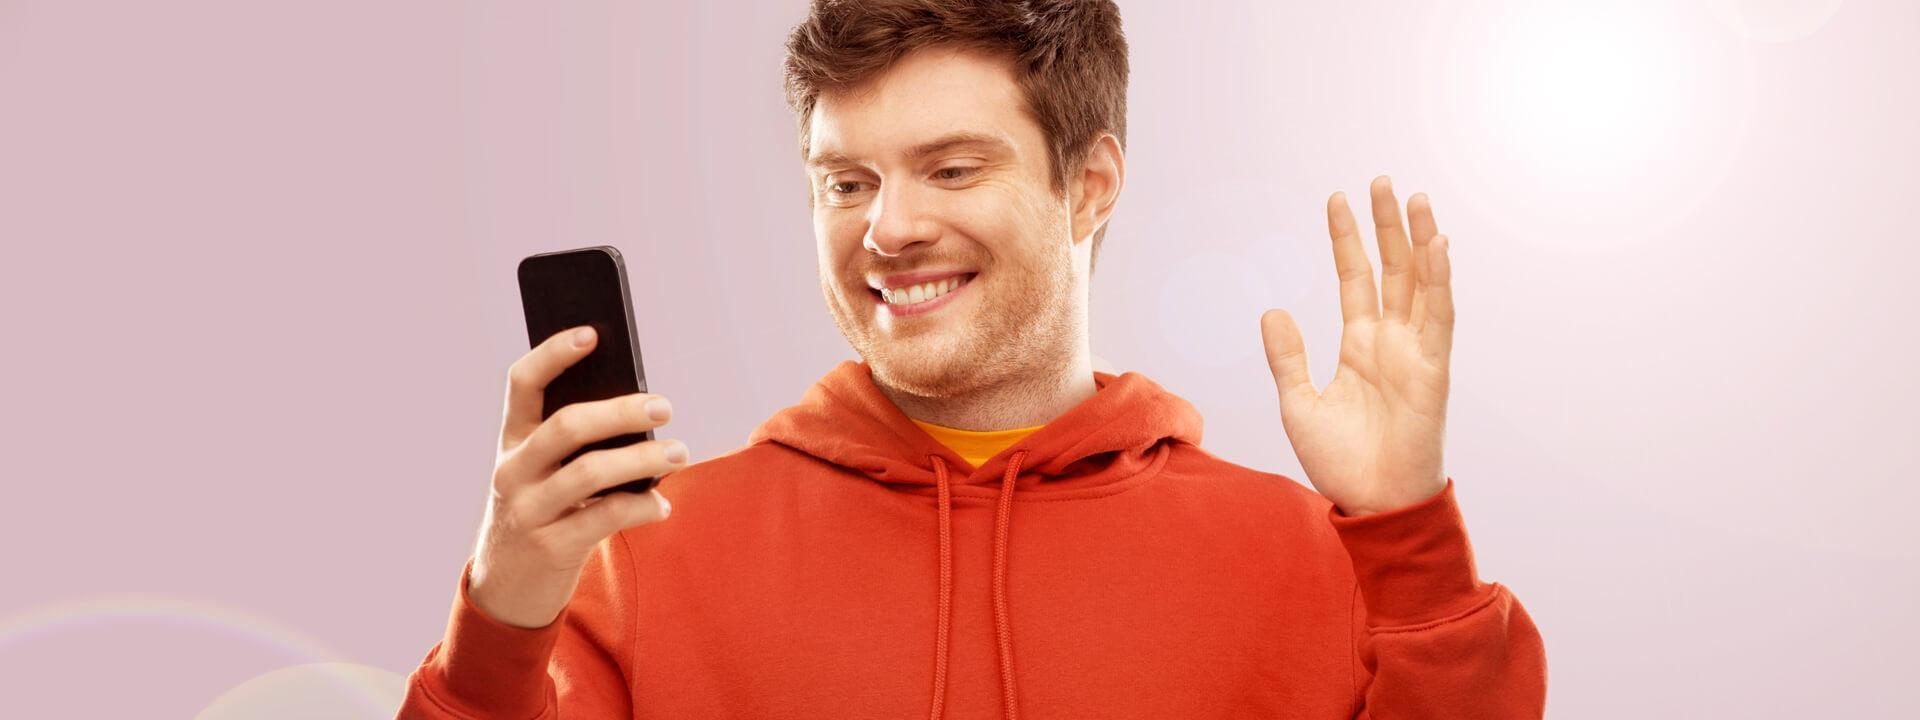 Profilbild Selfie